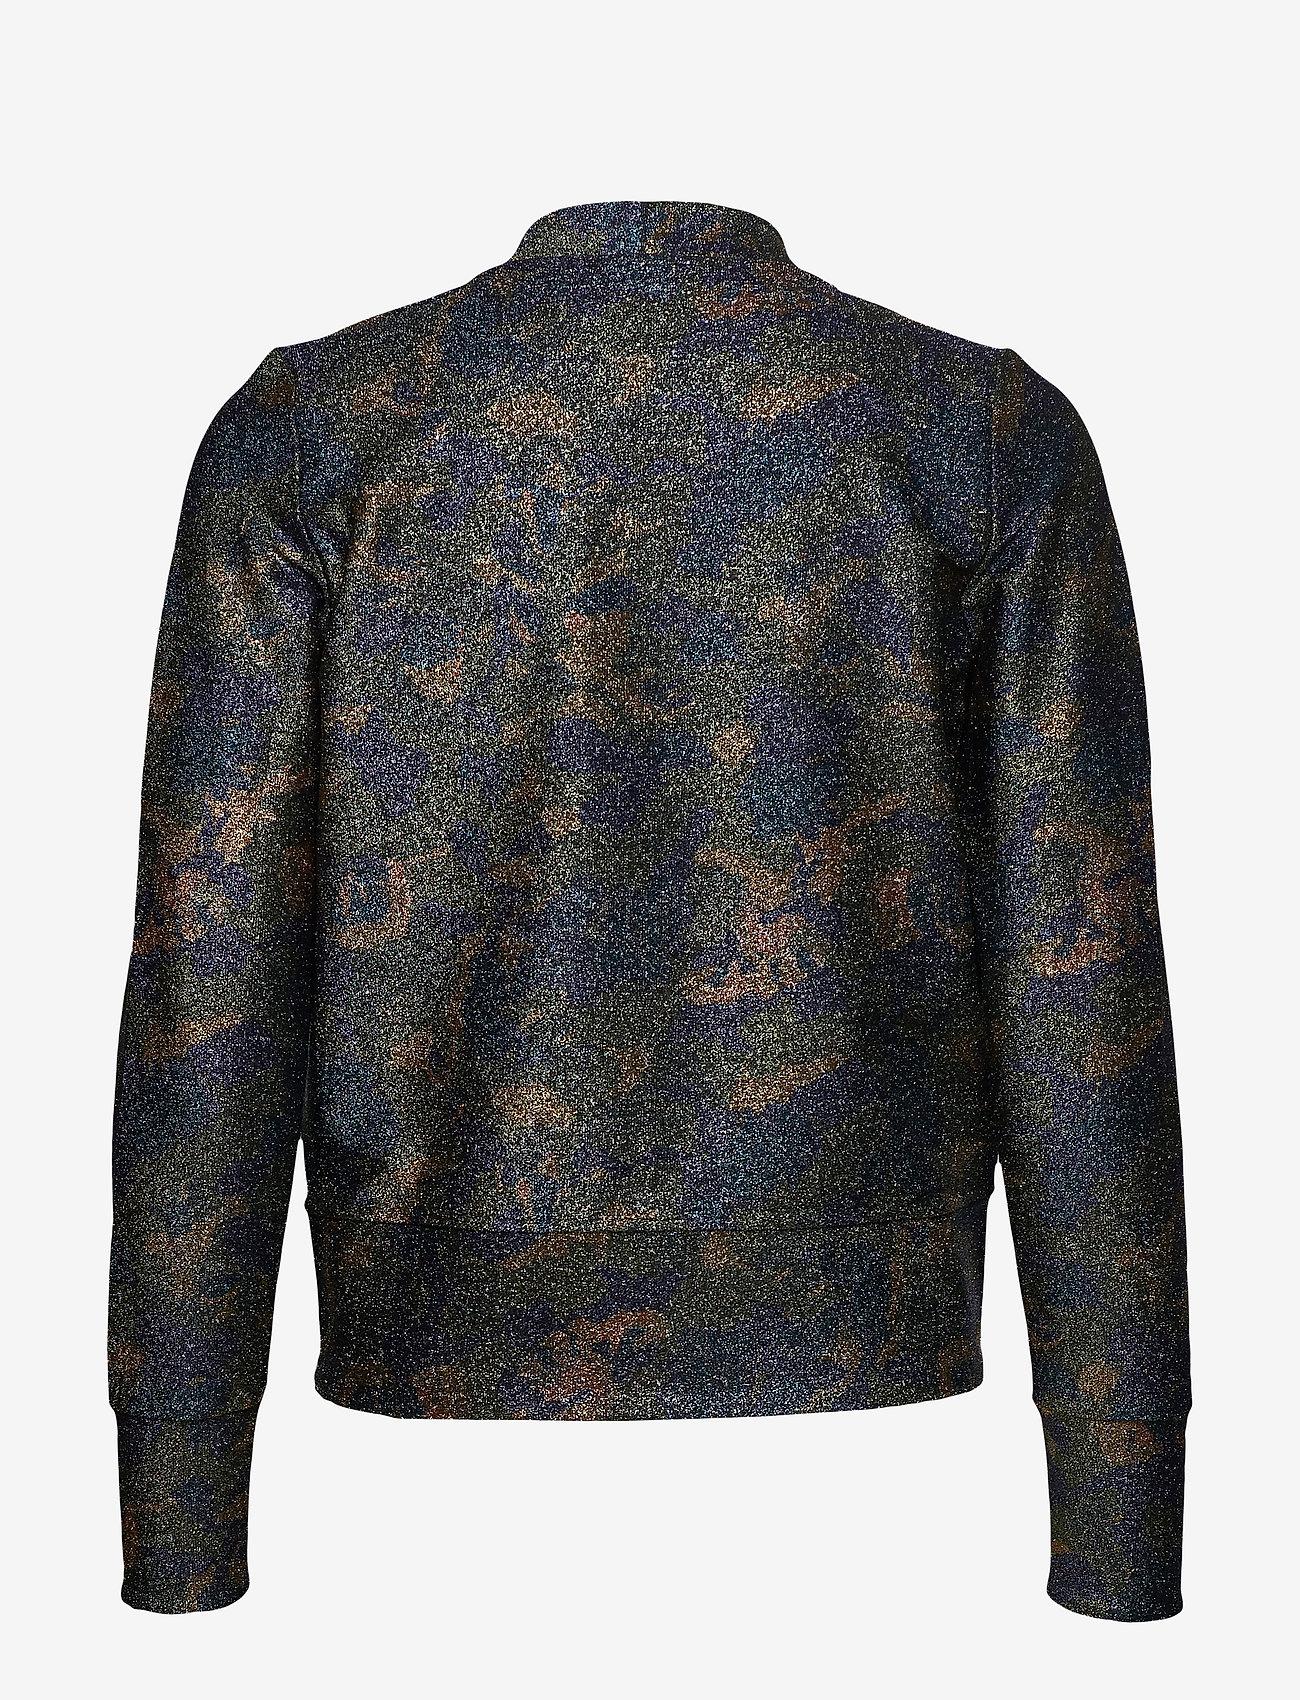 Lurex Jersey Cardigan (Kalamata) - Ganni R3B65p